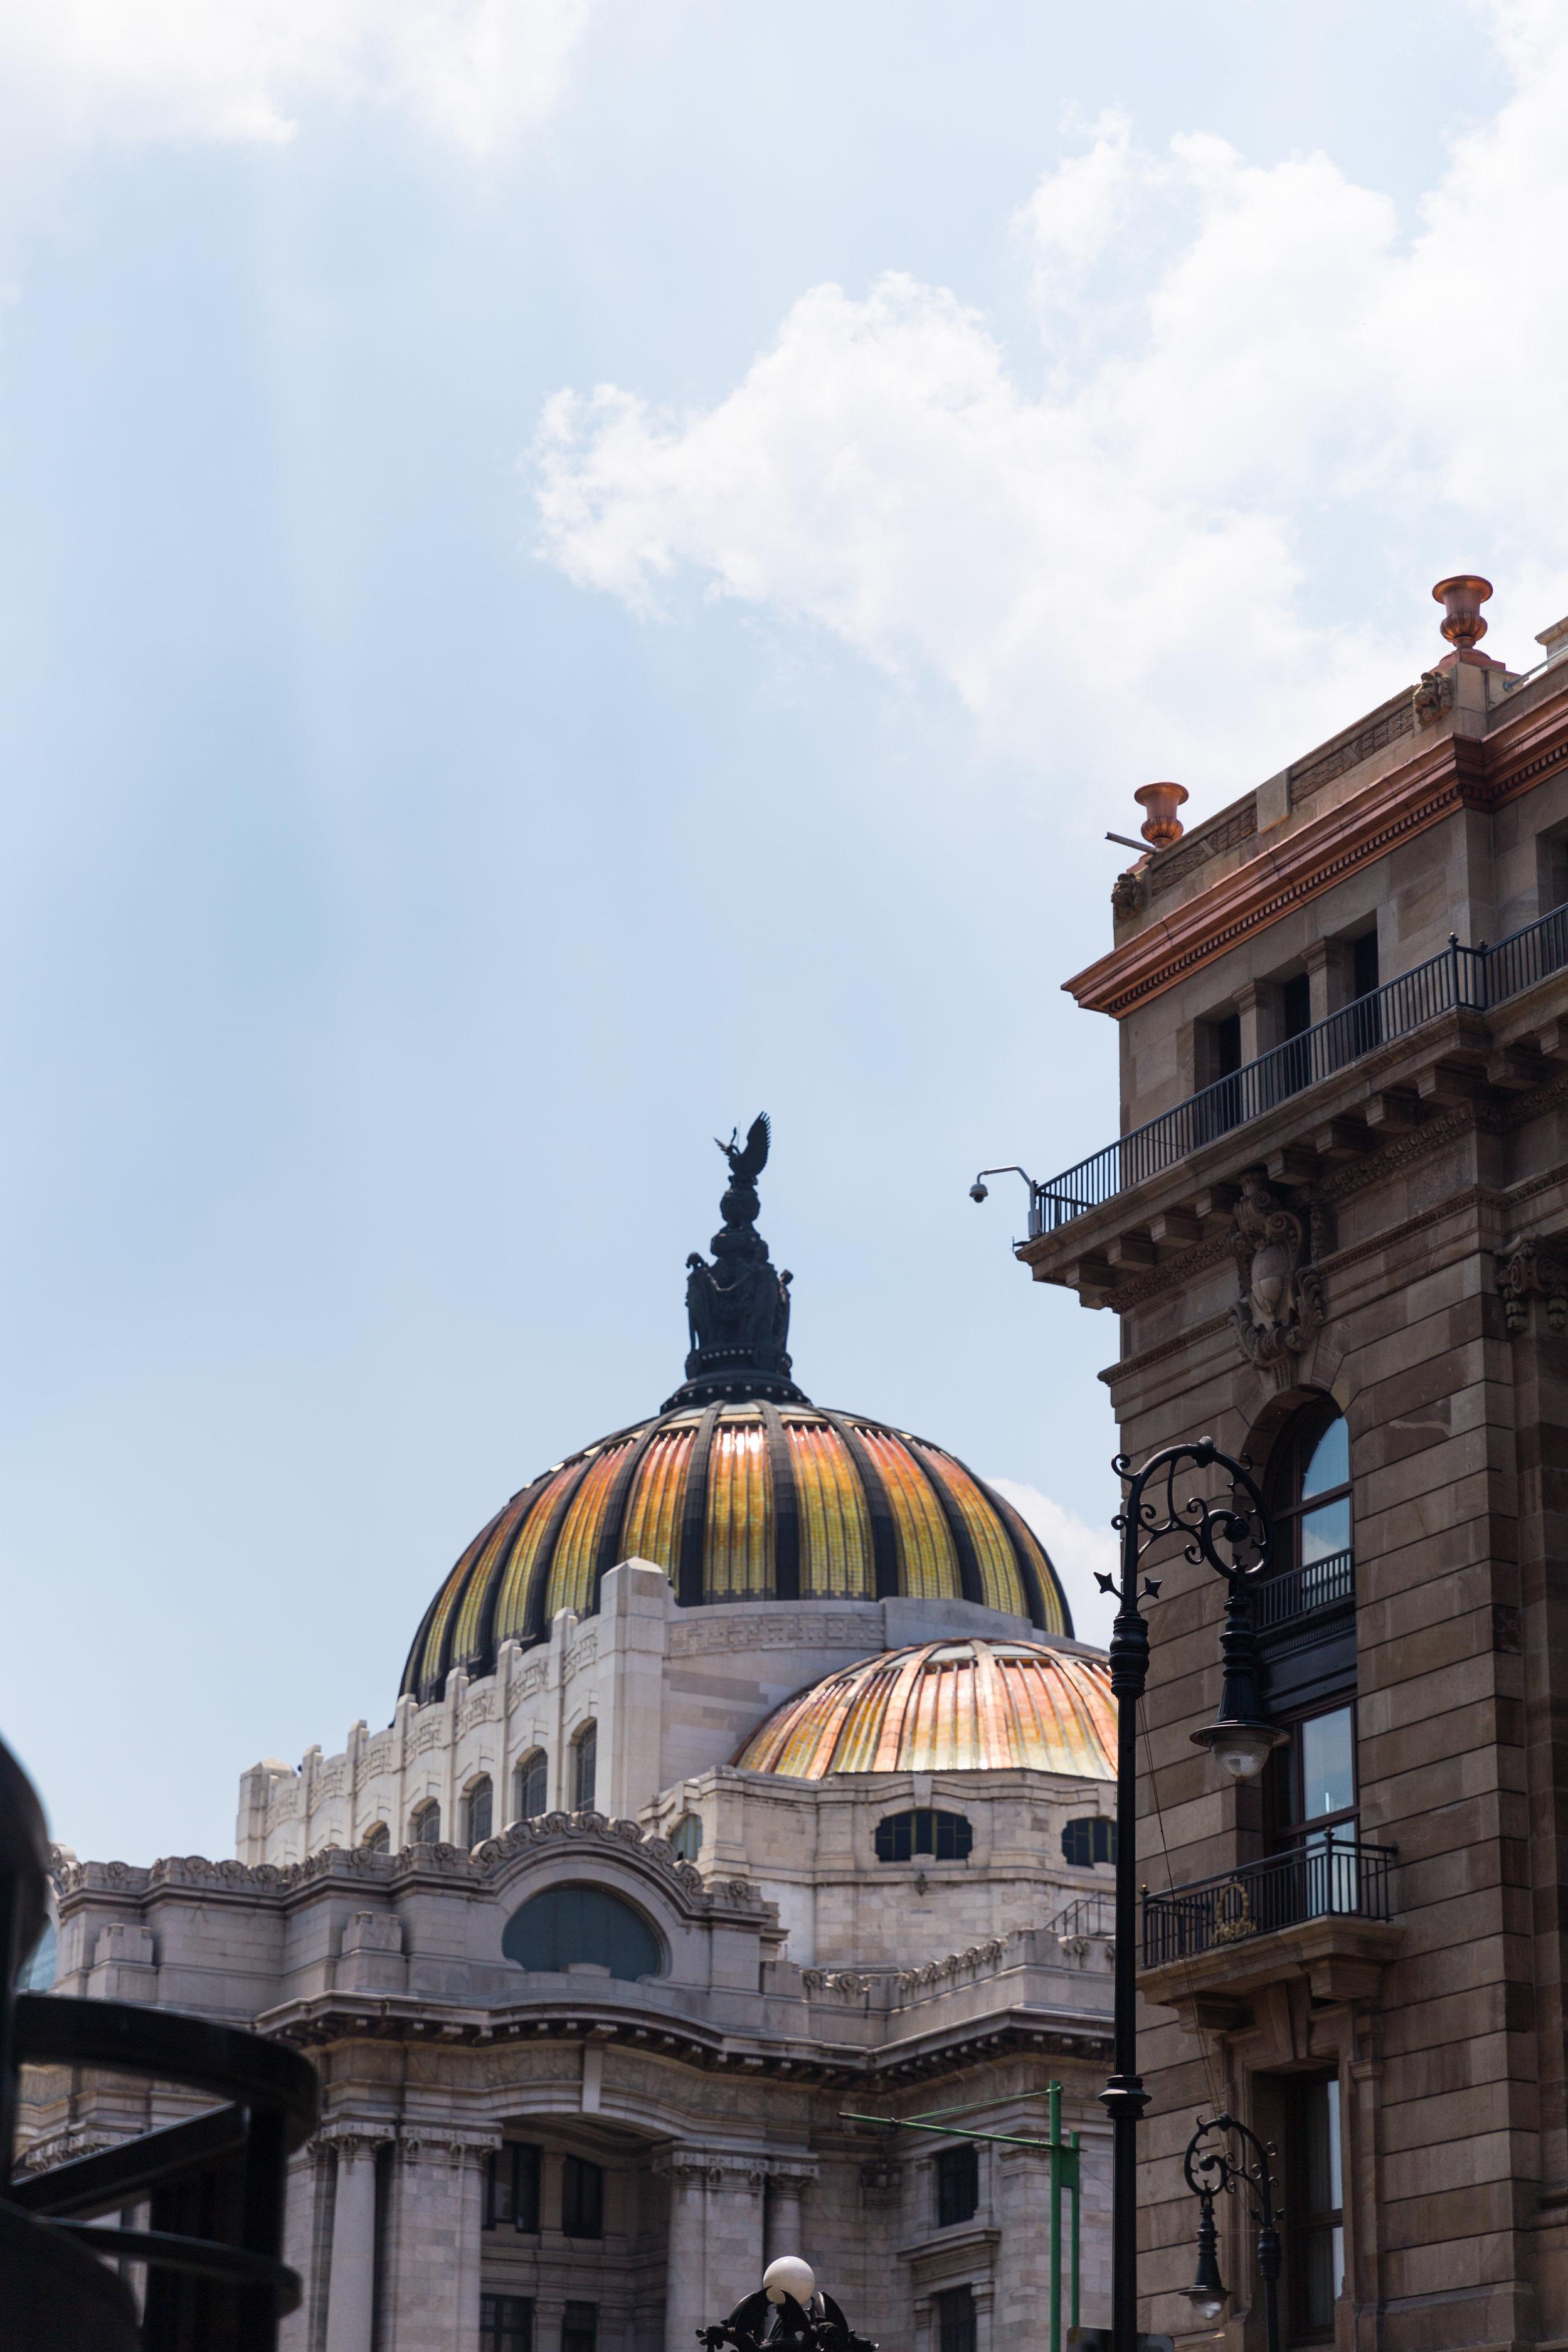 Mexico City Centro Historico-16.jpg